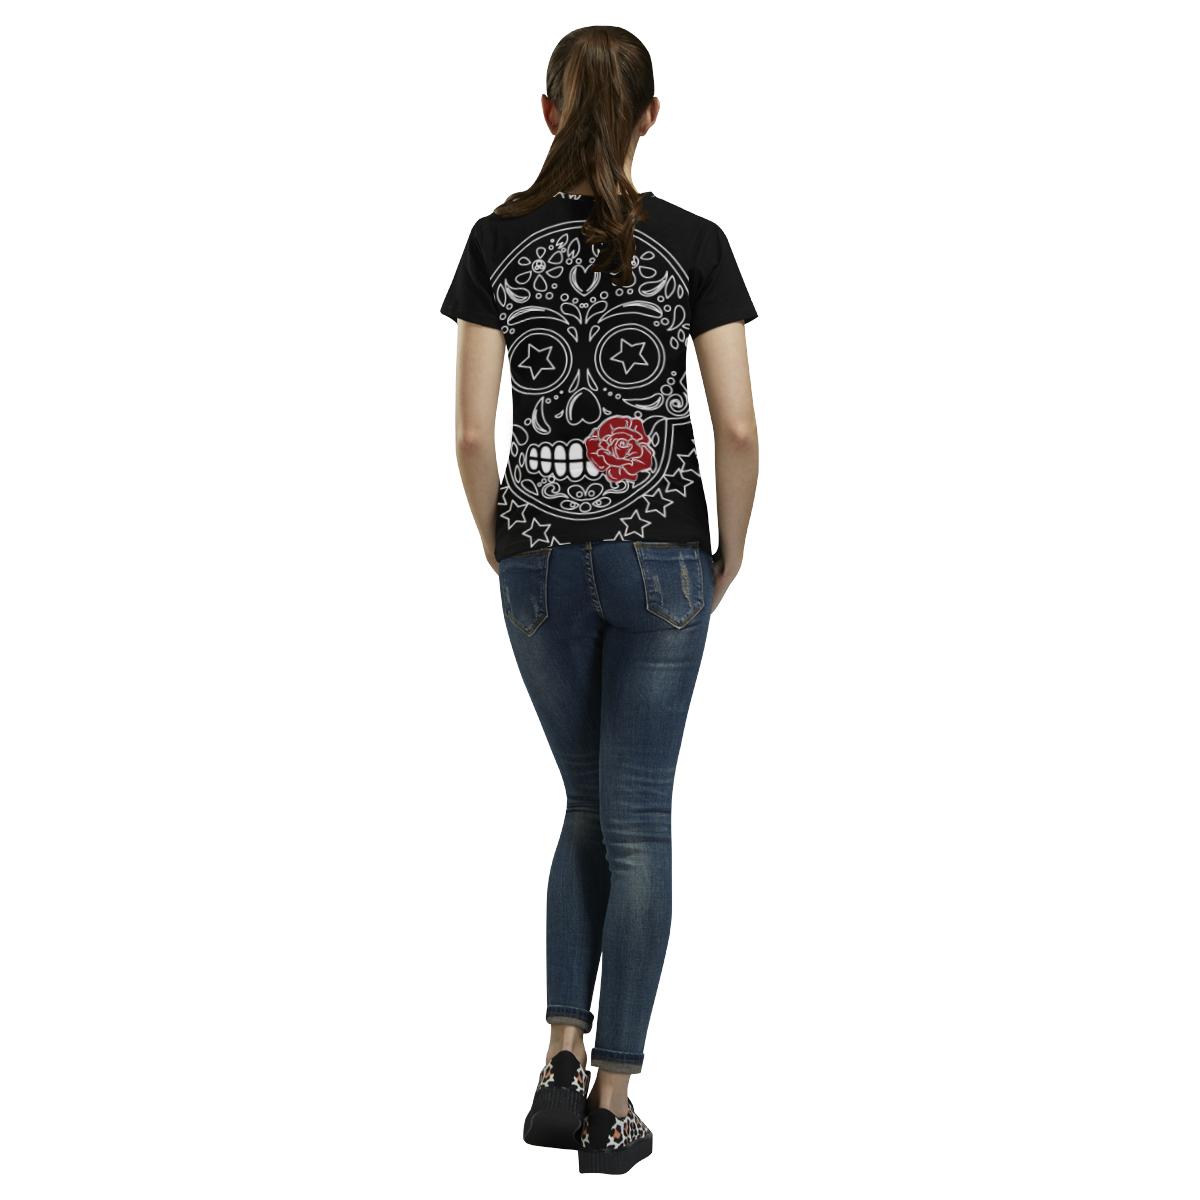 Sugar Skull Red Rose All Over Print T-Shirt for Women (USA Size) (Model T40)